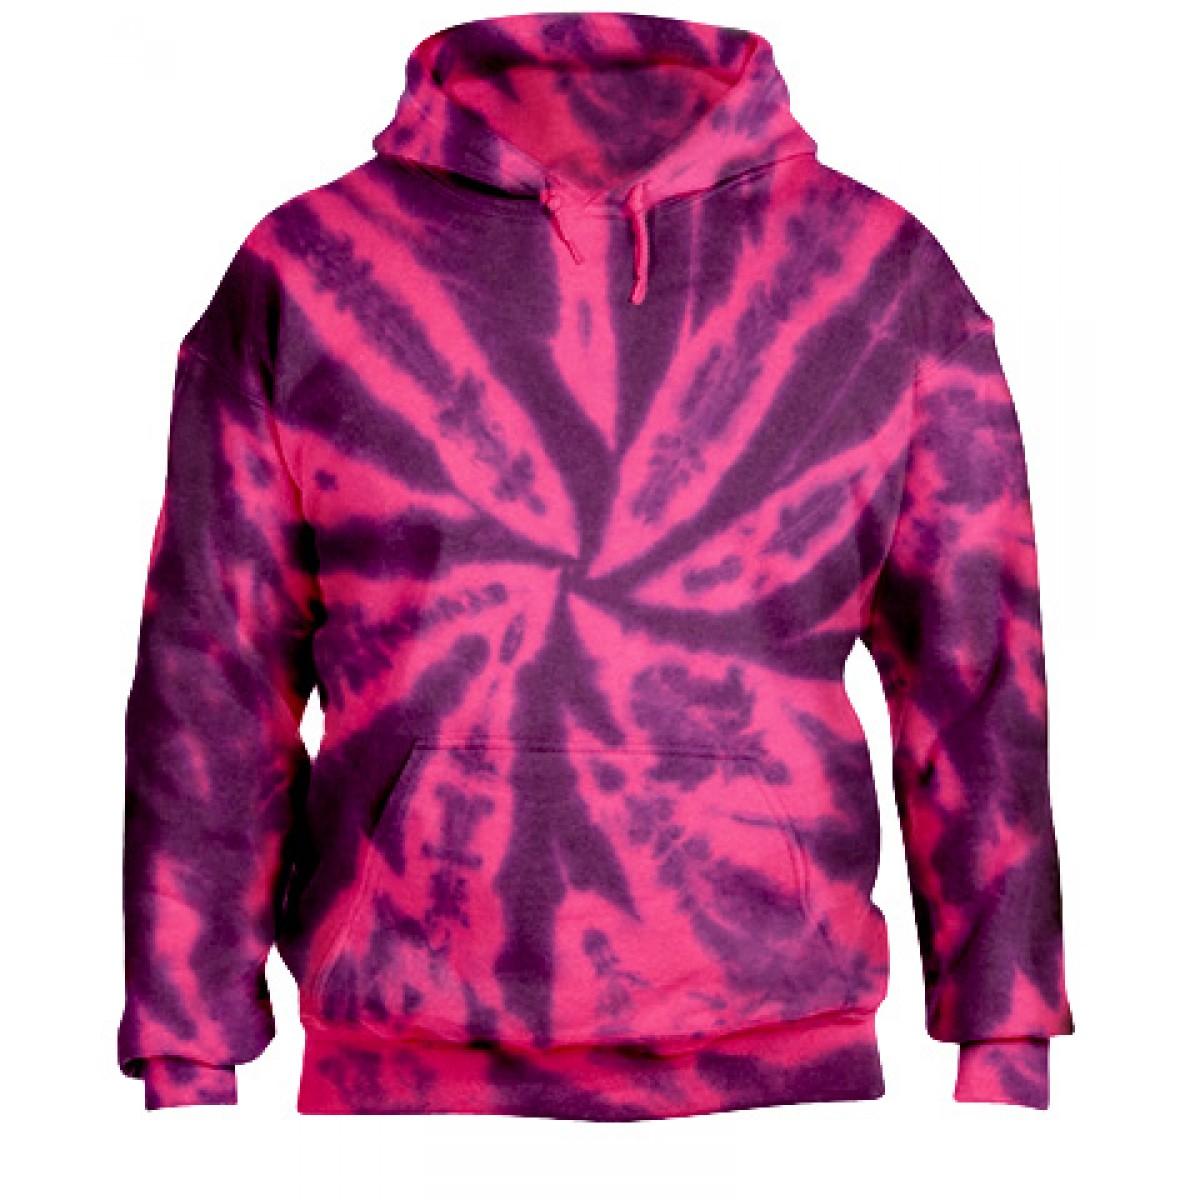 Tie-Dye Pullover Hooded Sweatshirt-Berry Purple-M